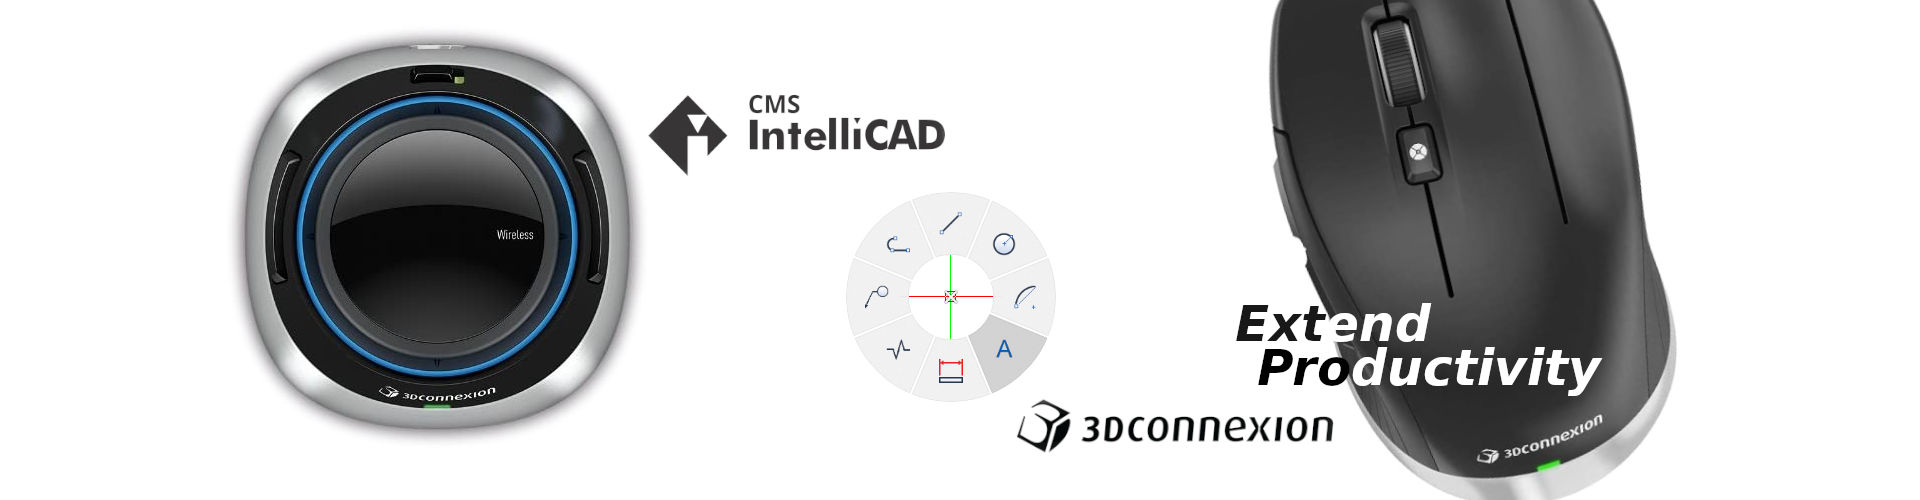 cms_intellicad_3dconnexion_slider